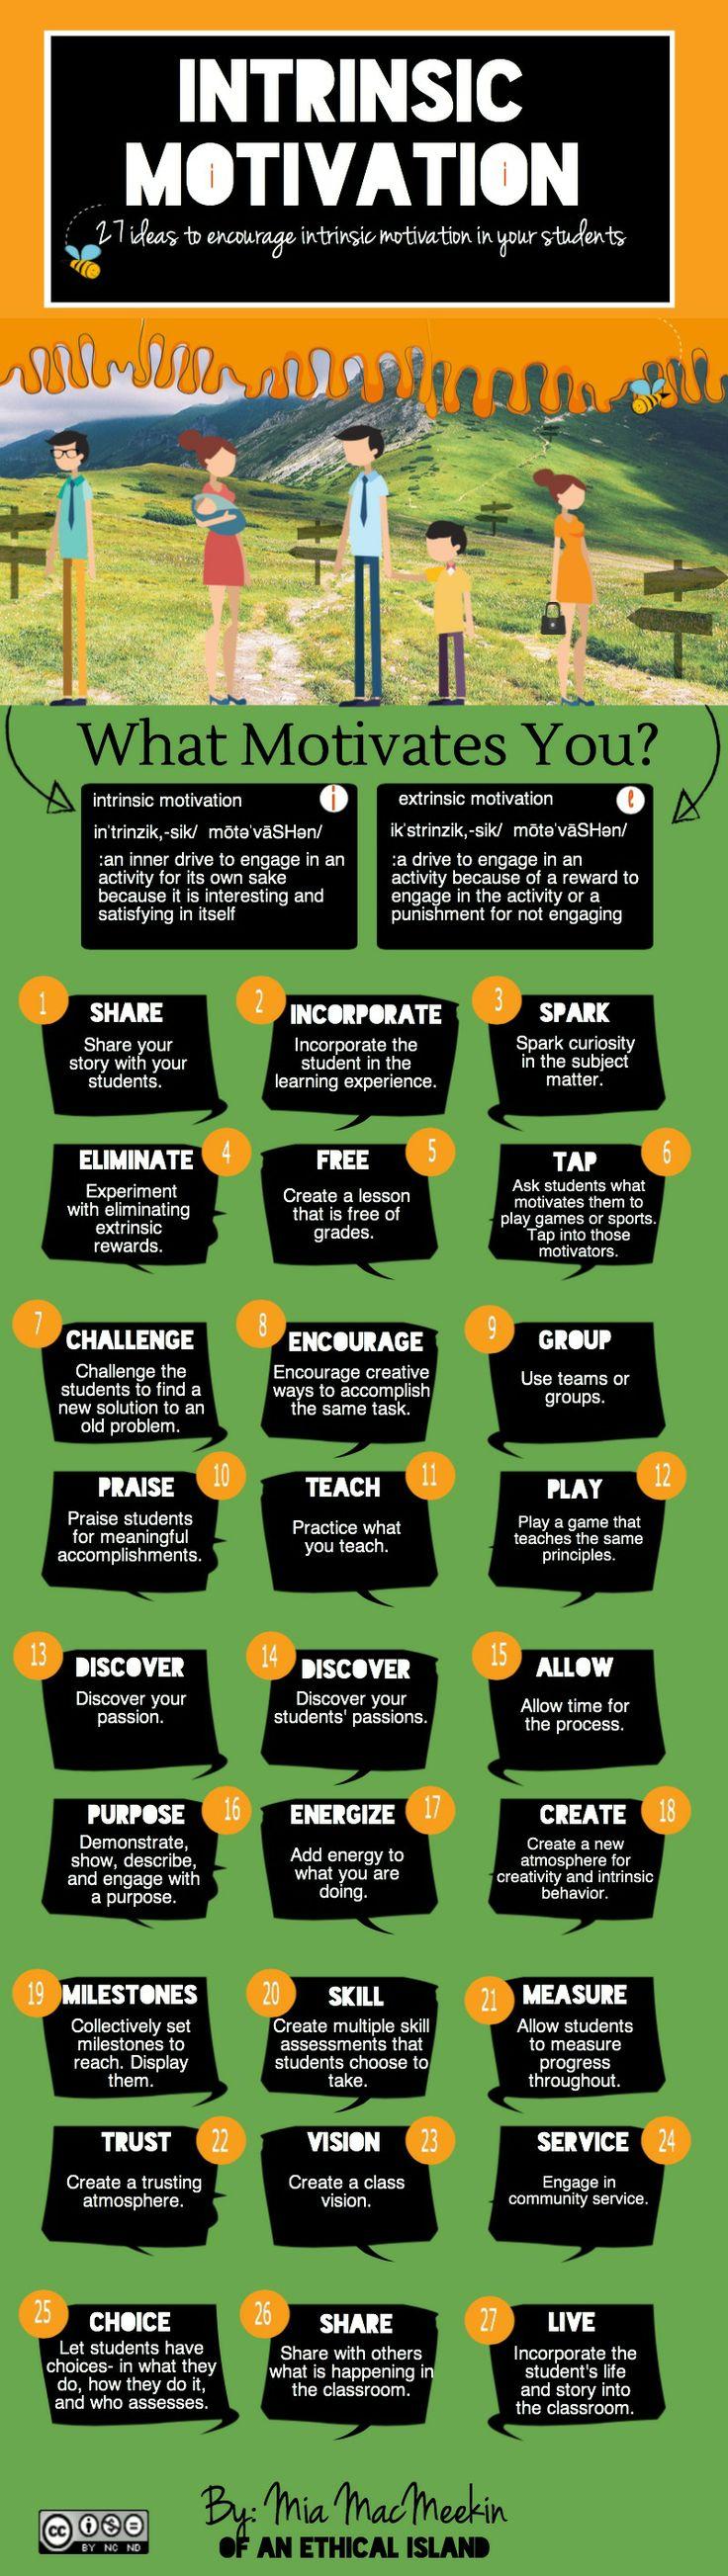 Intrinsic Motivation Ideas